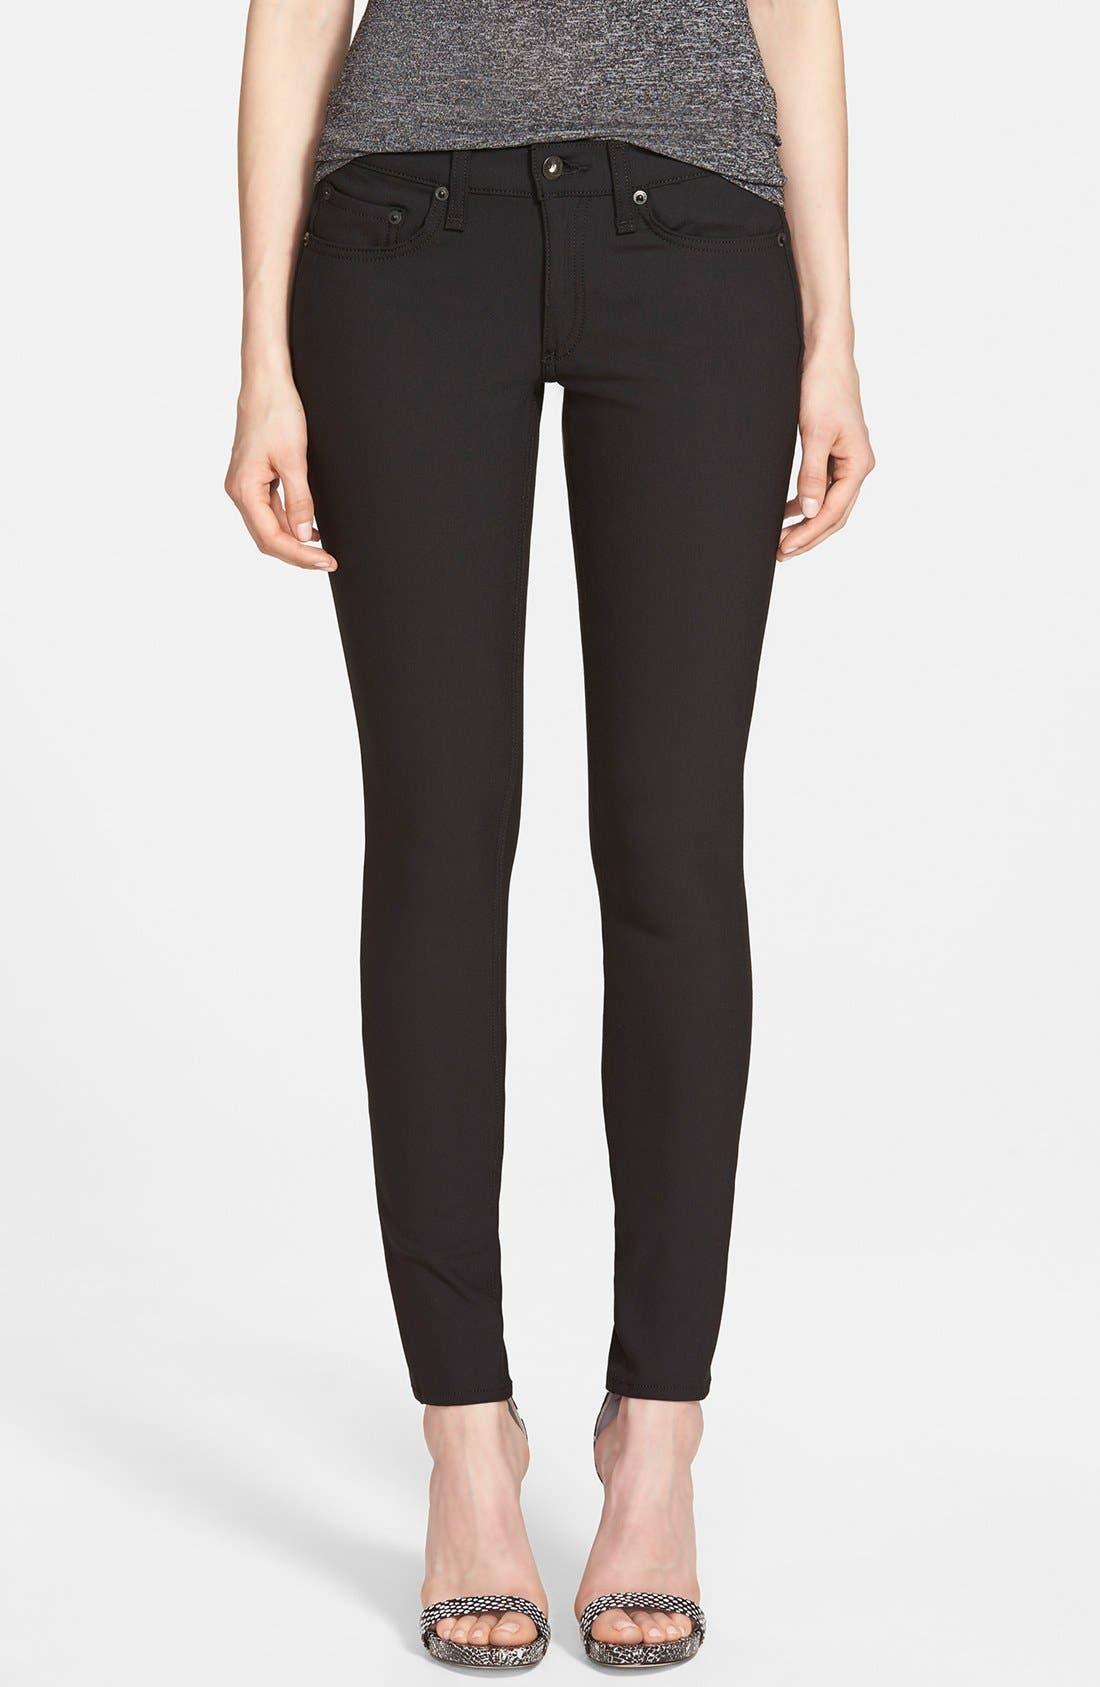 Alternate Image 1 Selected - rag & bone/JEAN Skinny Jeans (Equestrian)